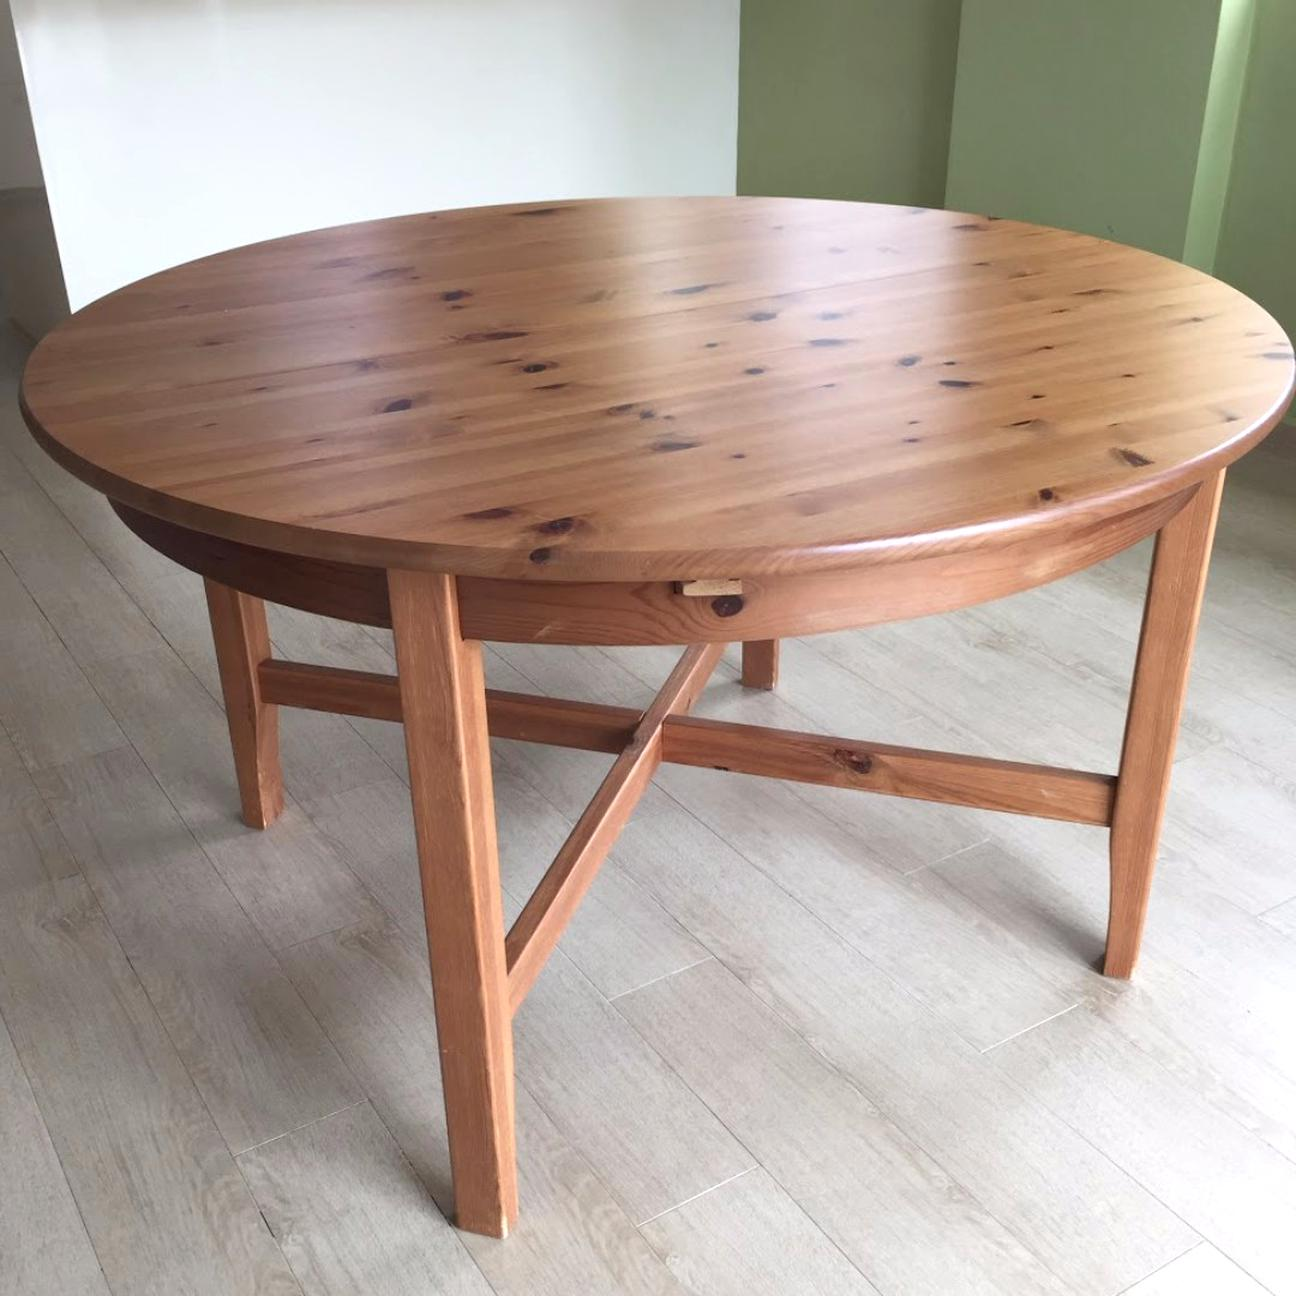 table leksvik ikea d occasion